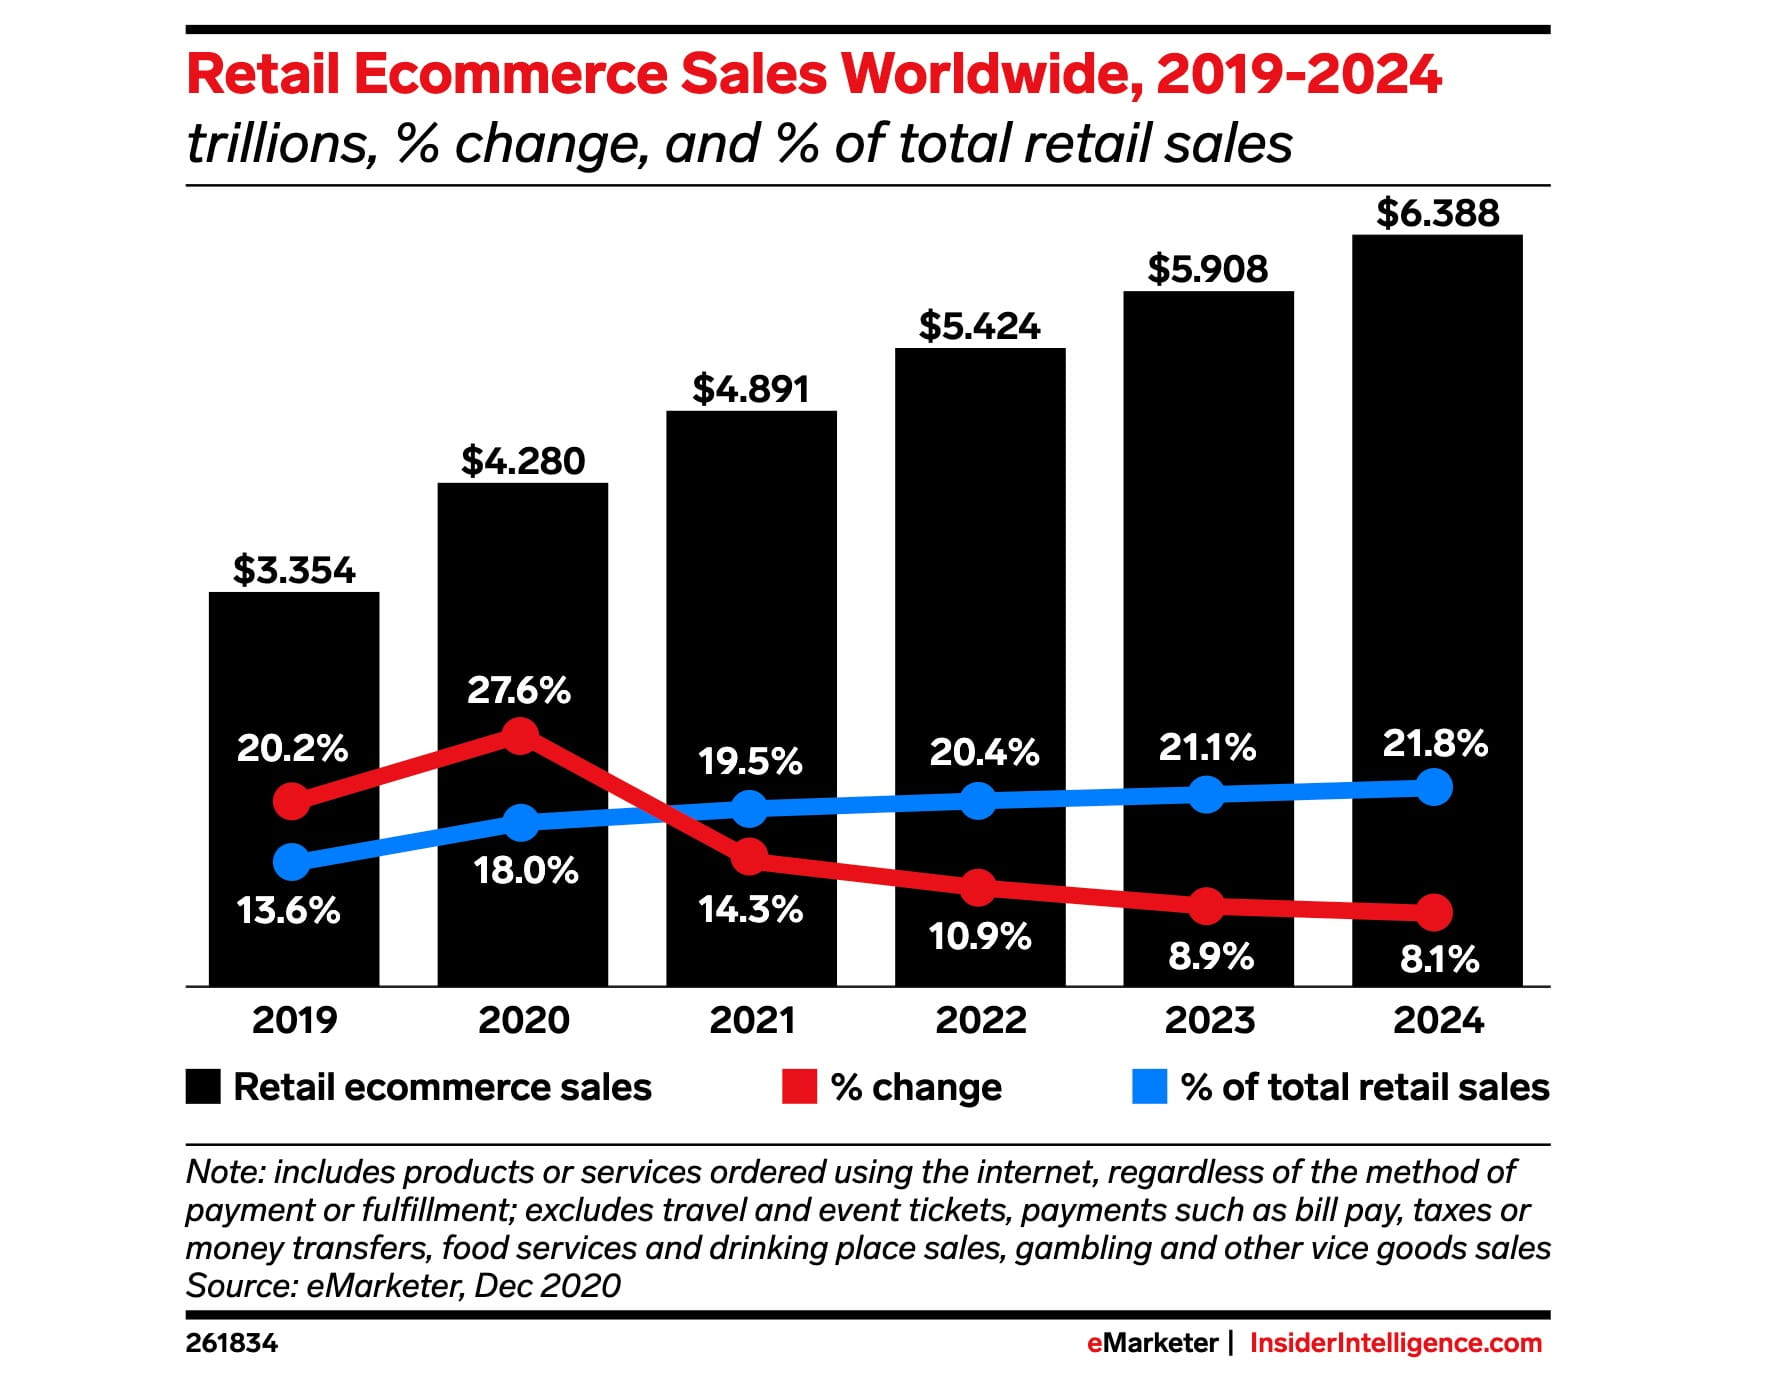 global retail online sales by 2024